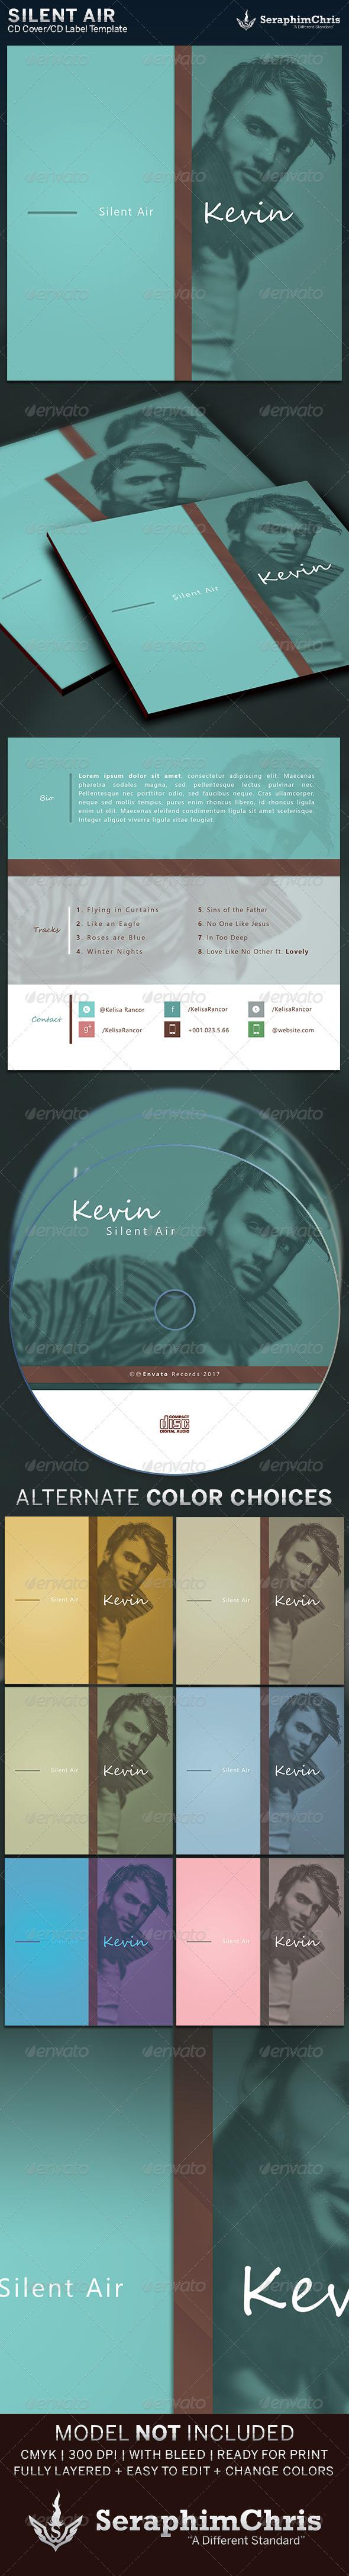 Silent Air: CD Cover Artwork Template - CD & DVD Artwork Print Templates